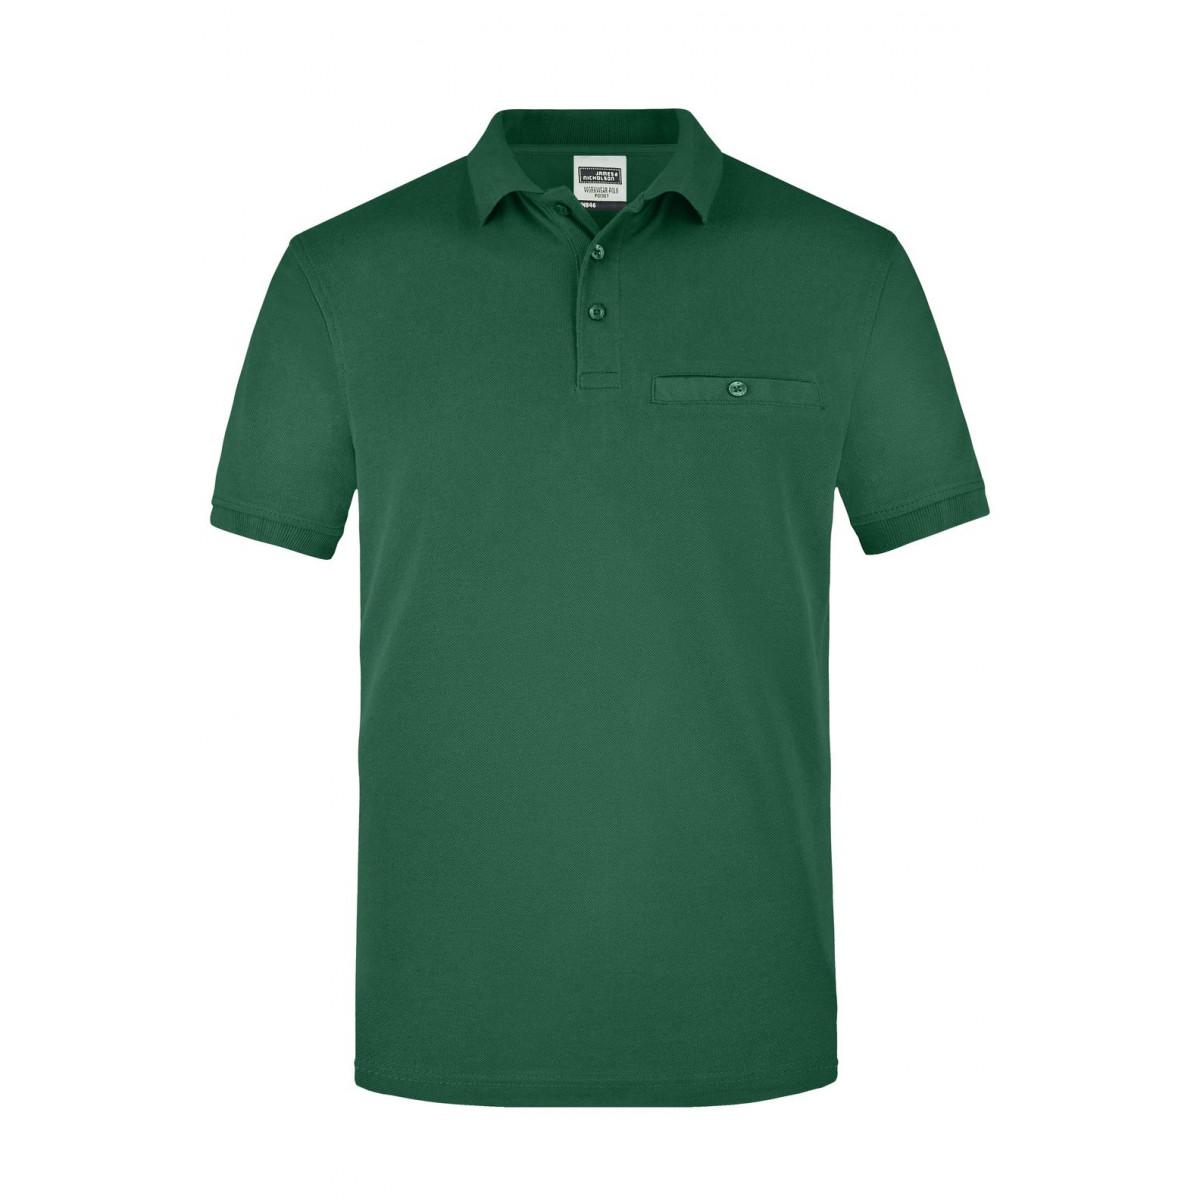 Рубашка поло мужская JN846 Men´s Workwear Polo Pocket - Темно-зеленый